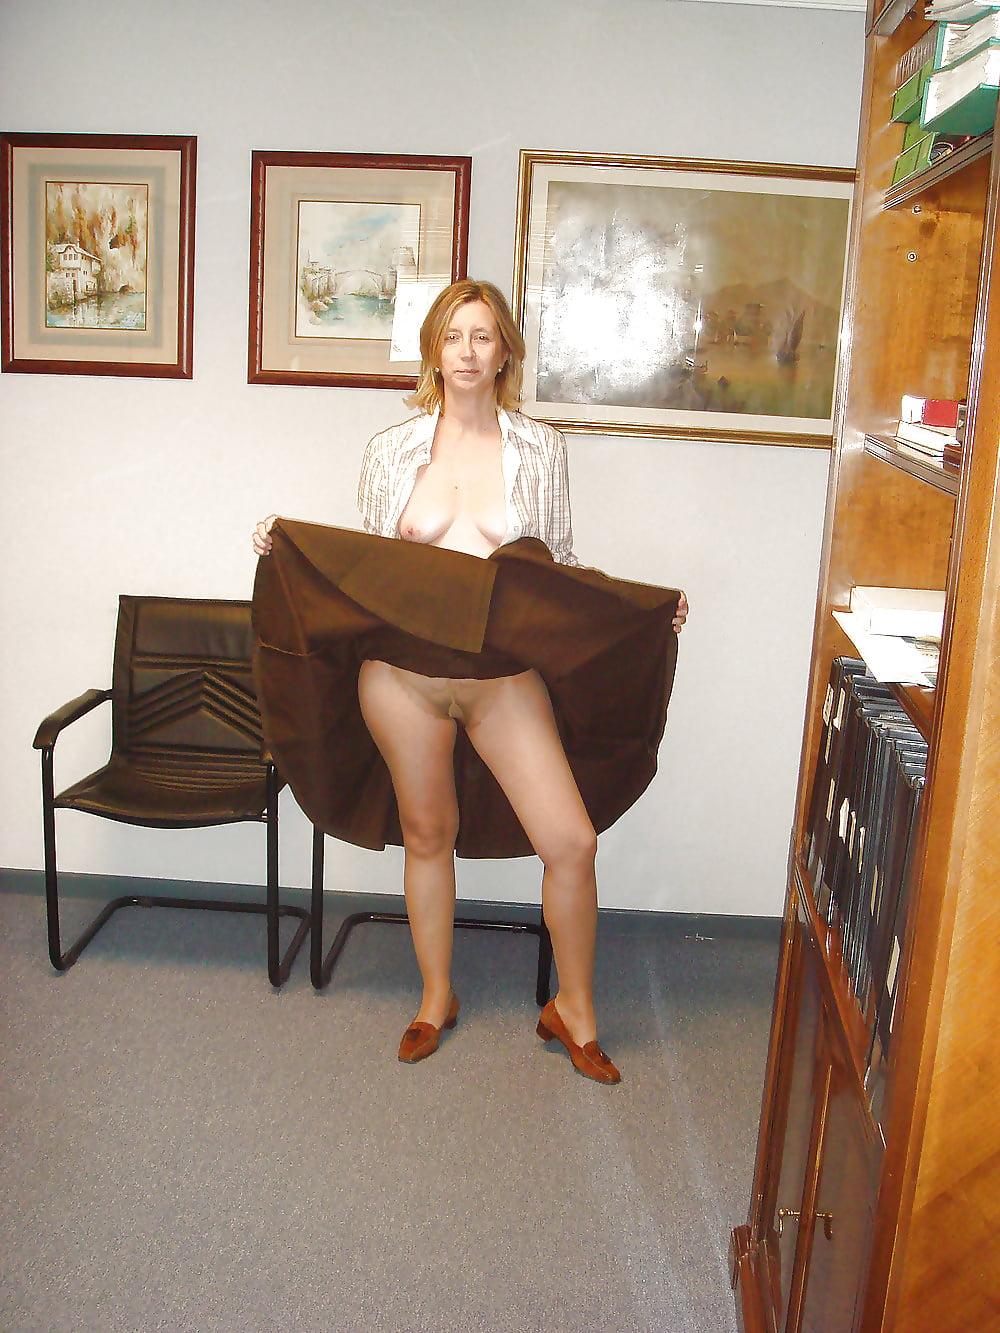 Жена ходит на работу в чулках